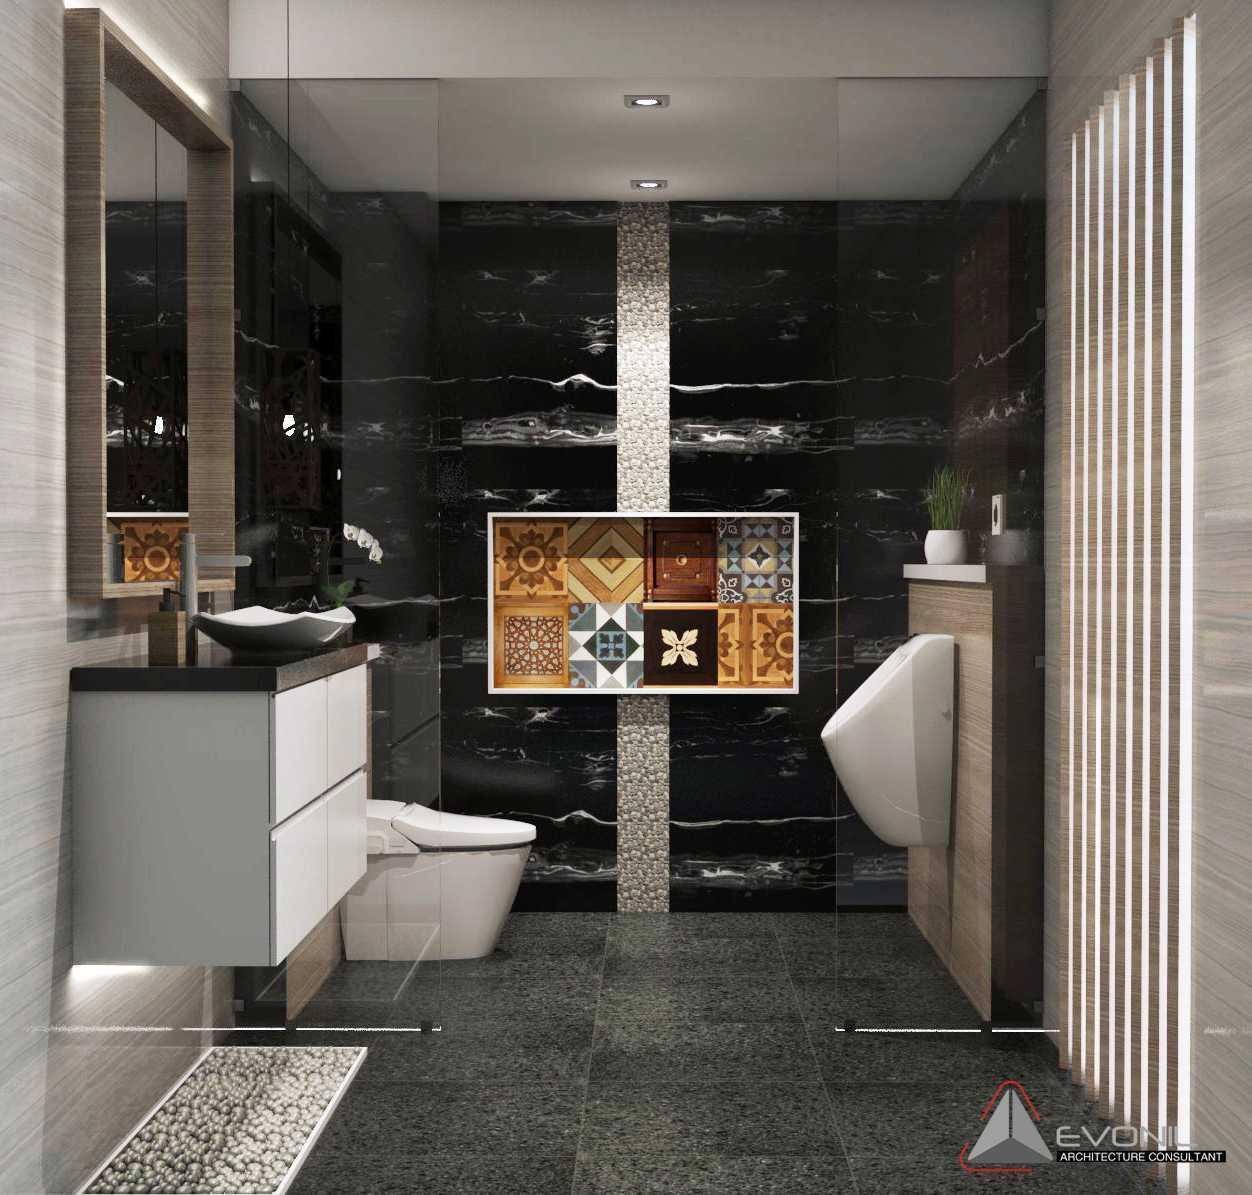 Evonil Architecture Residence Pangkalan Bun Pangkalan Bun, Kalimantan, Indonesia Pangkalan Bun, Kalimantan, Indonesia Wc-Guest-Room-Residence-Pangkalan-Bun Modern 13160